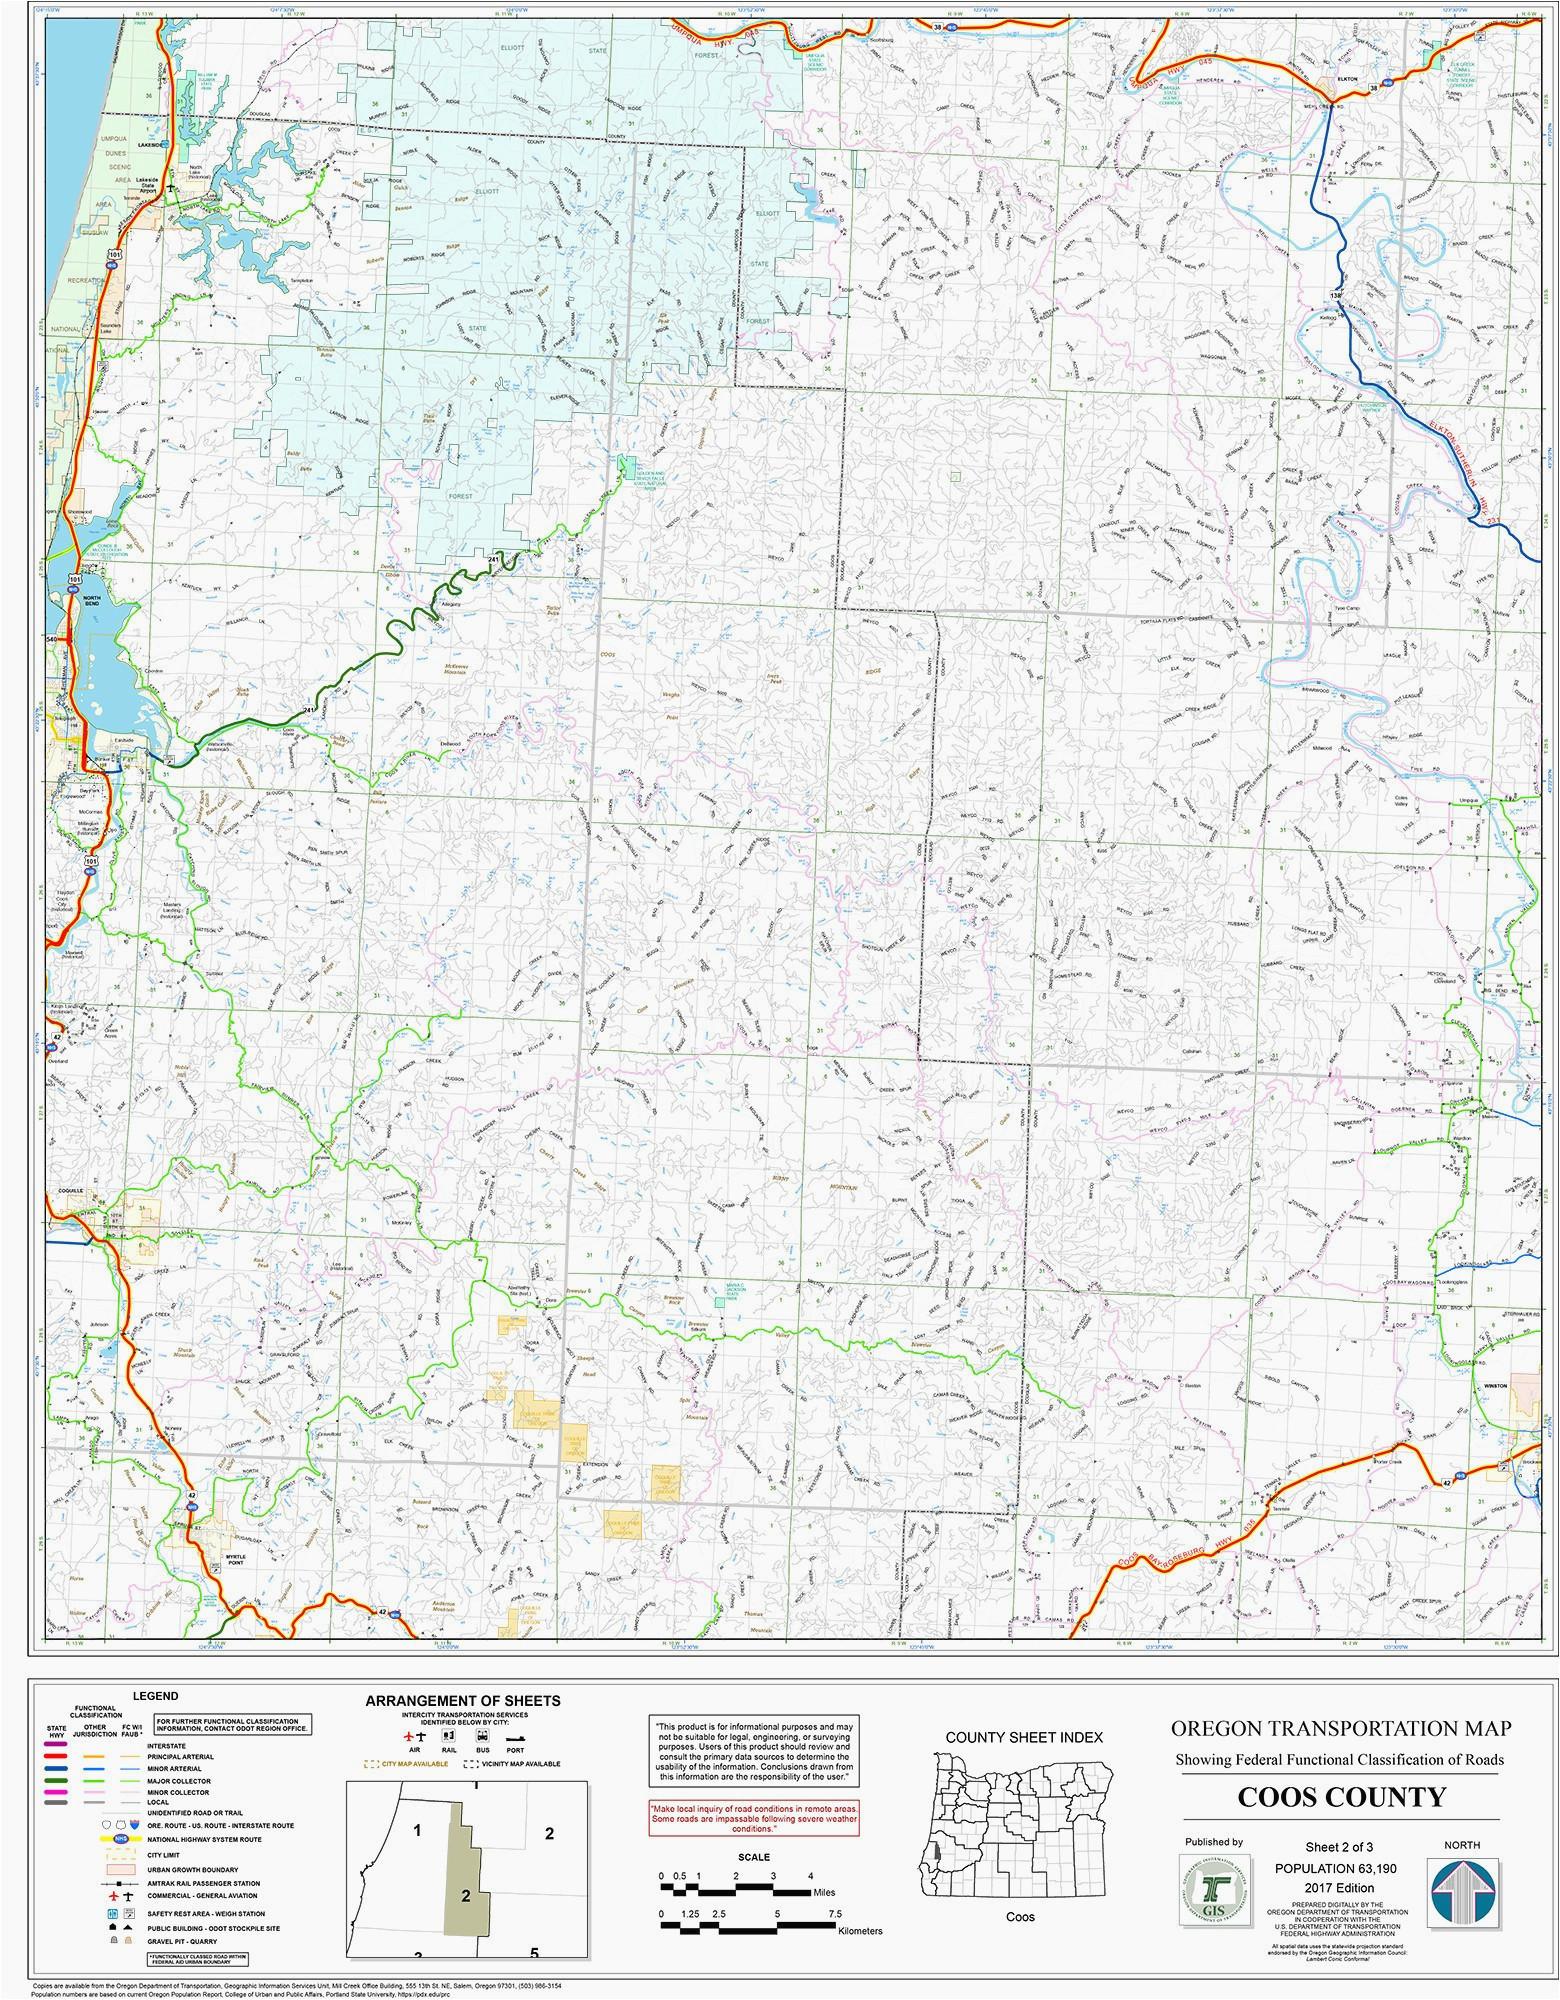 Maps Google Com Ireland Google Maps Lansing Michigan Google Maps Boise Beautiful 30 Best